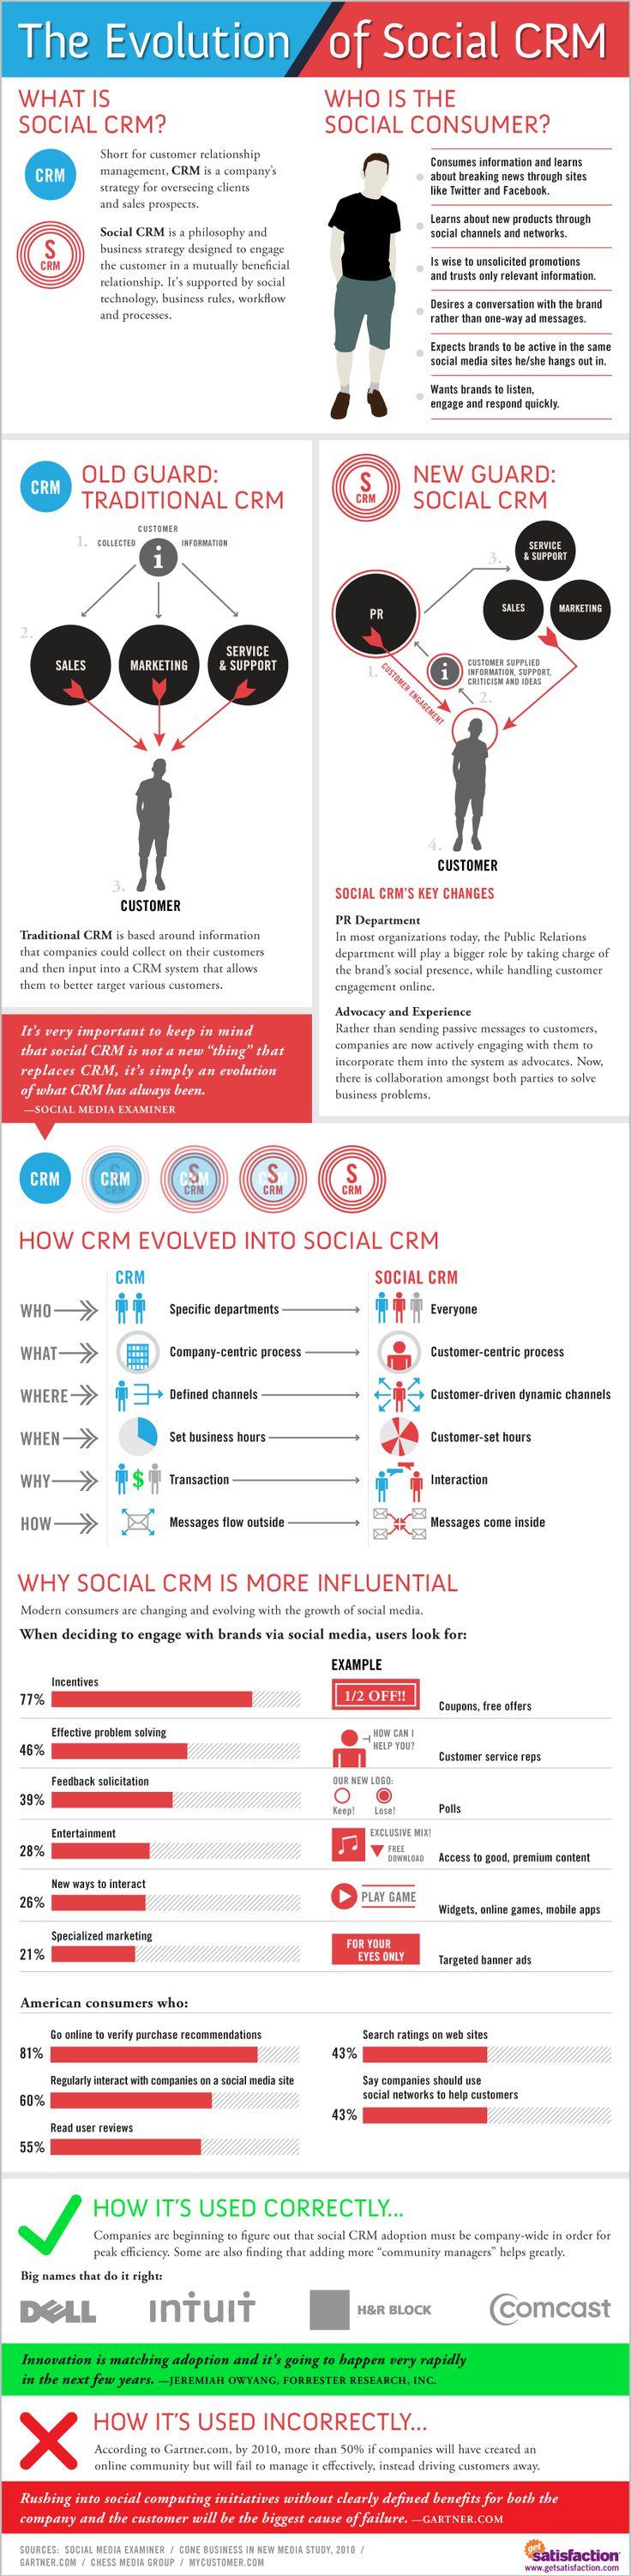 Evolution of social CRM.... #socialmedia #digitalmediaCustom Relationships, Website, Web Site, Social Media, Socialcrm, Infographic, Socialmedia, Social Crm, Relationships Management